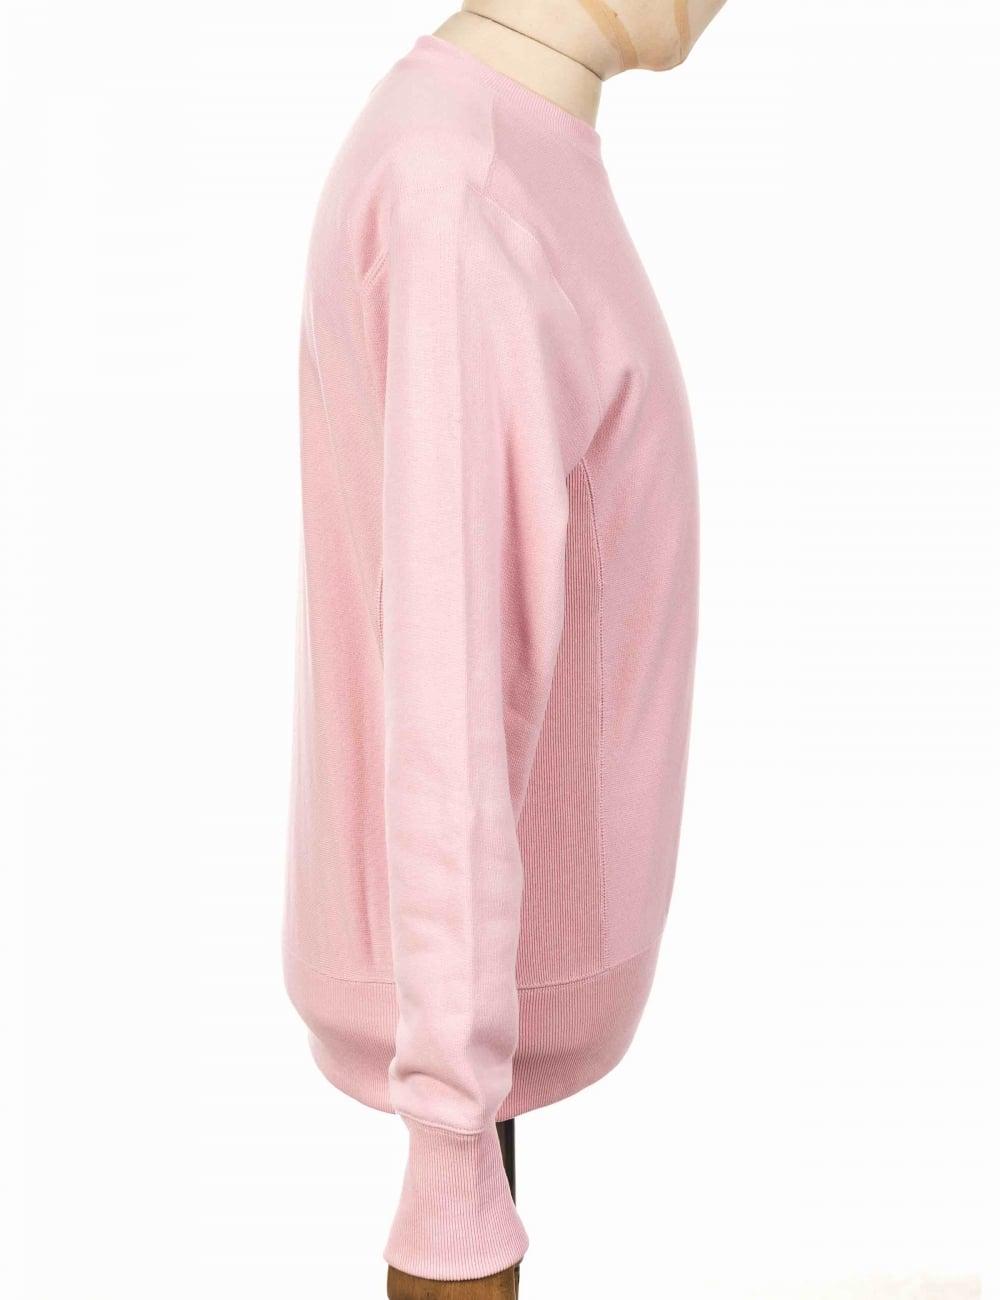 ee676946b9da Champion Reverse Weave Crewneck Sweatshirt - CBS Pink - Clothing ...